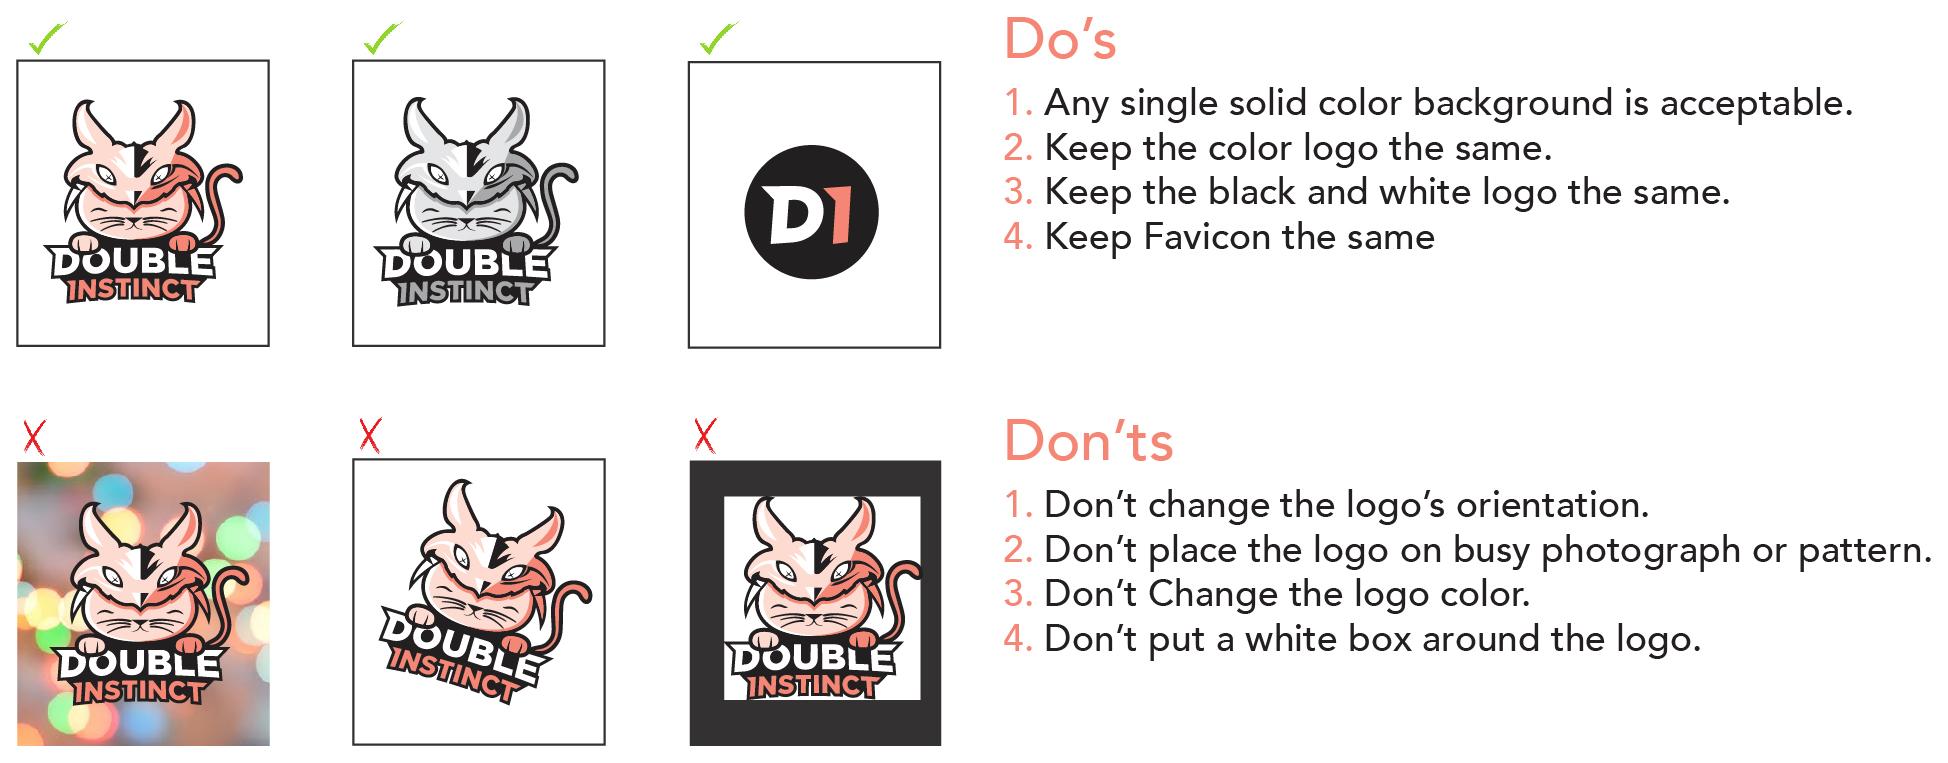 Double Instinct dos &donts-01.jpg